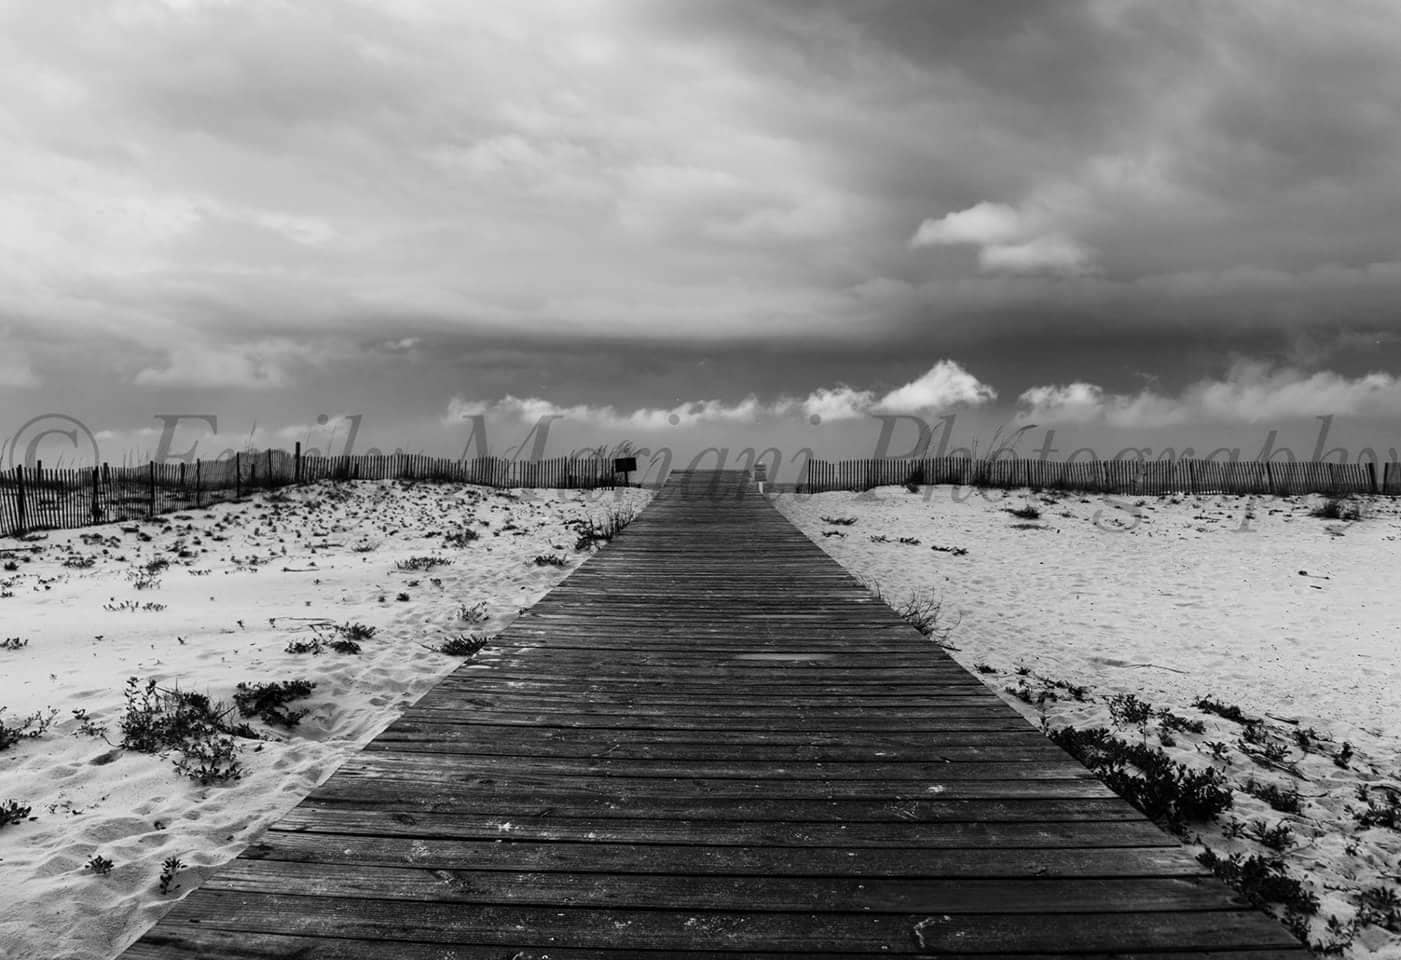 Ocean photography black and white photography beach prints ocean prints bridge prints nature photography landscape photography prints